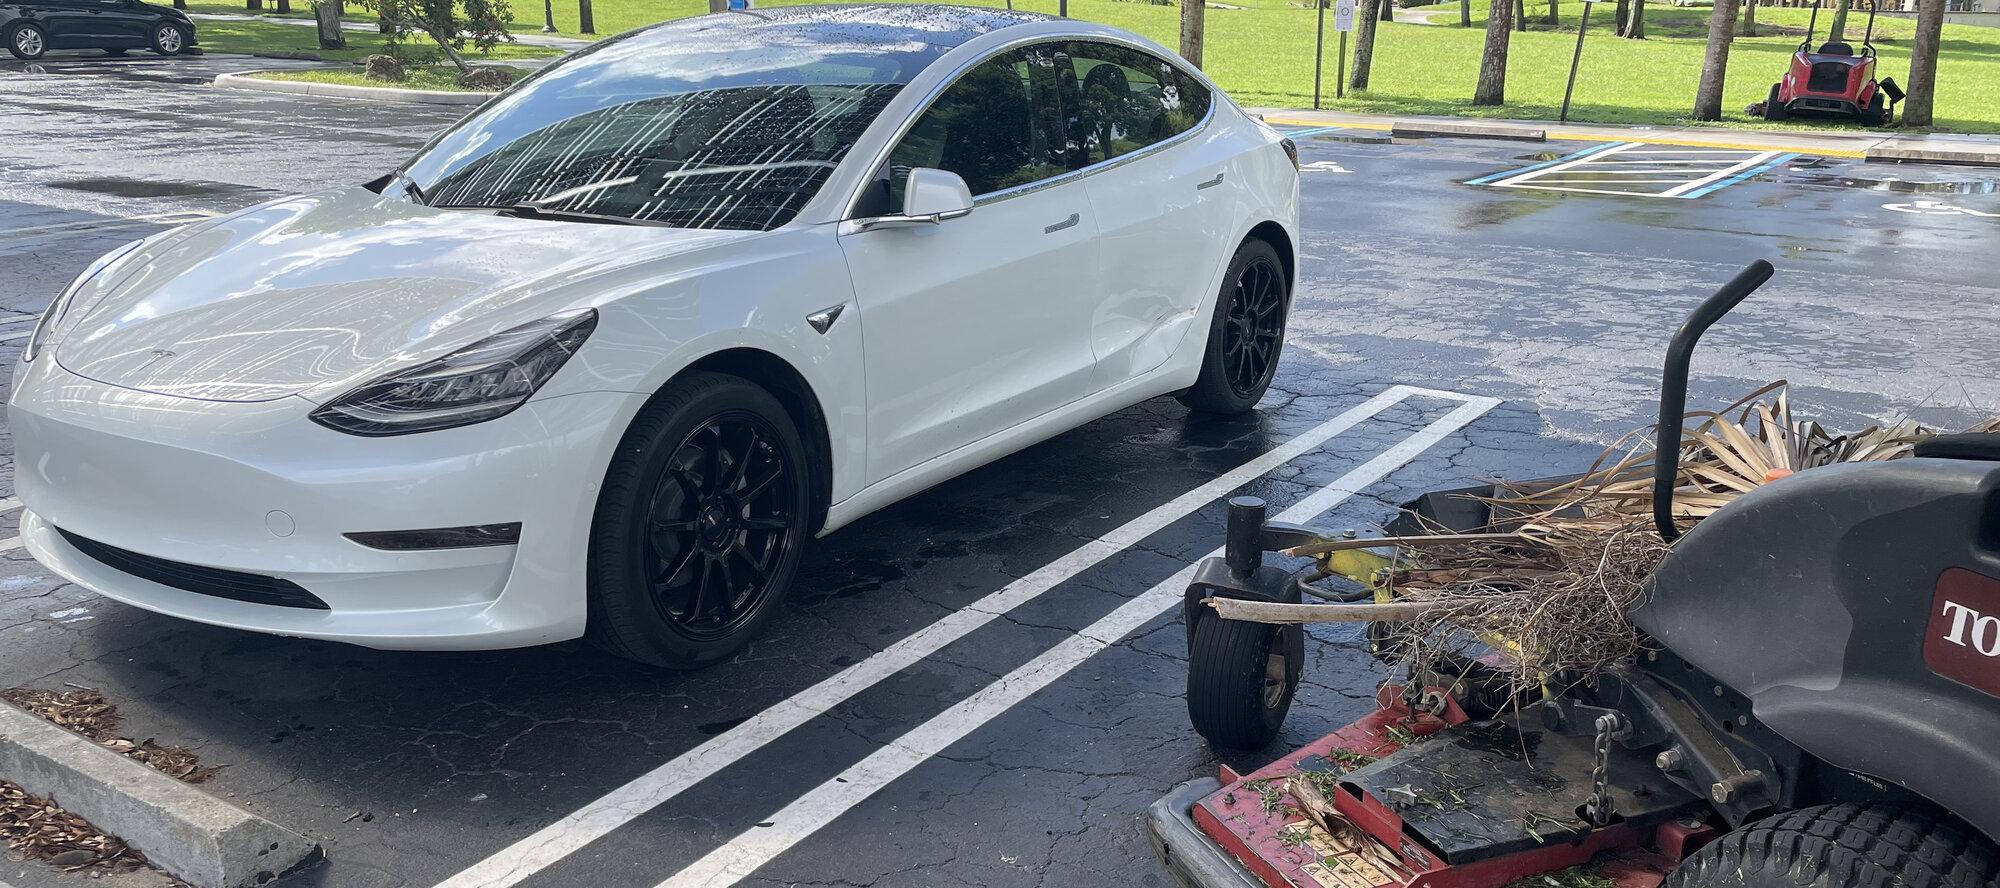 Tesla parked lawnmower.jpeg